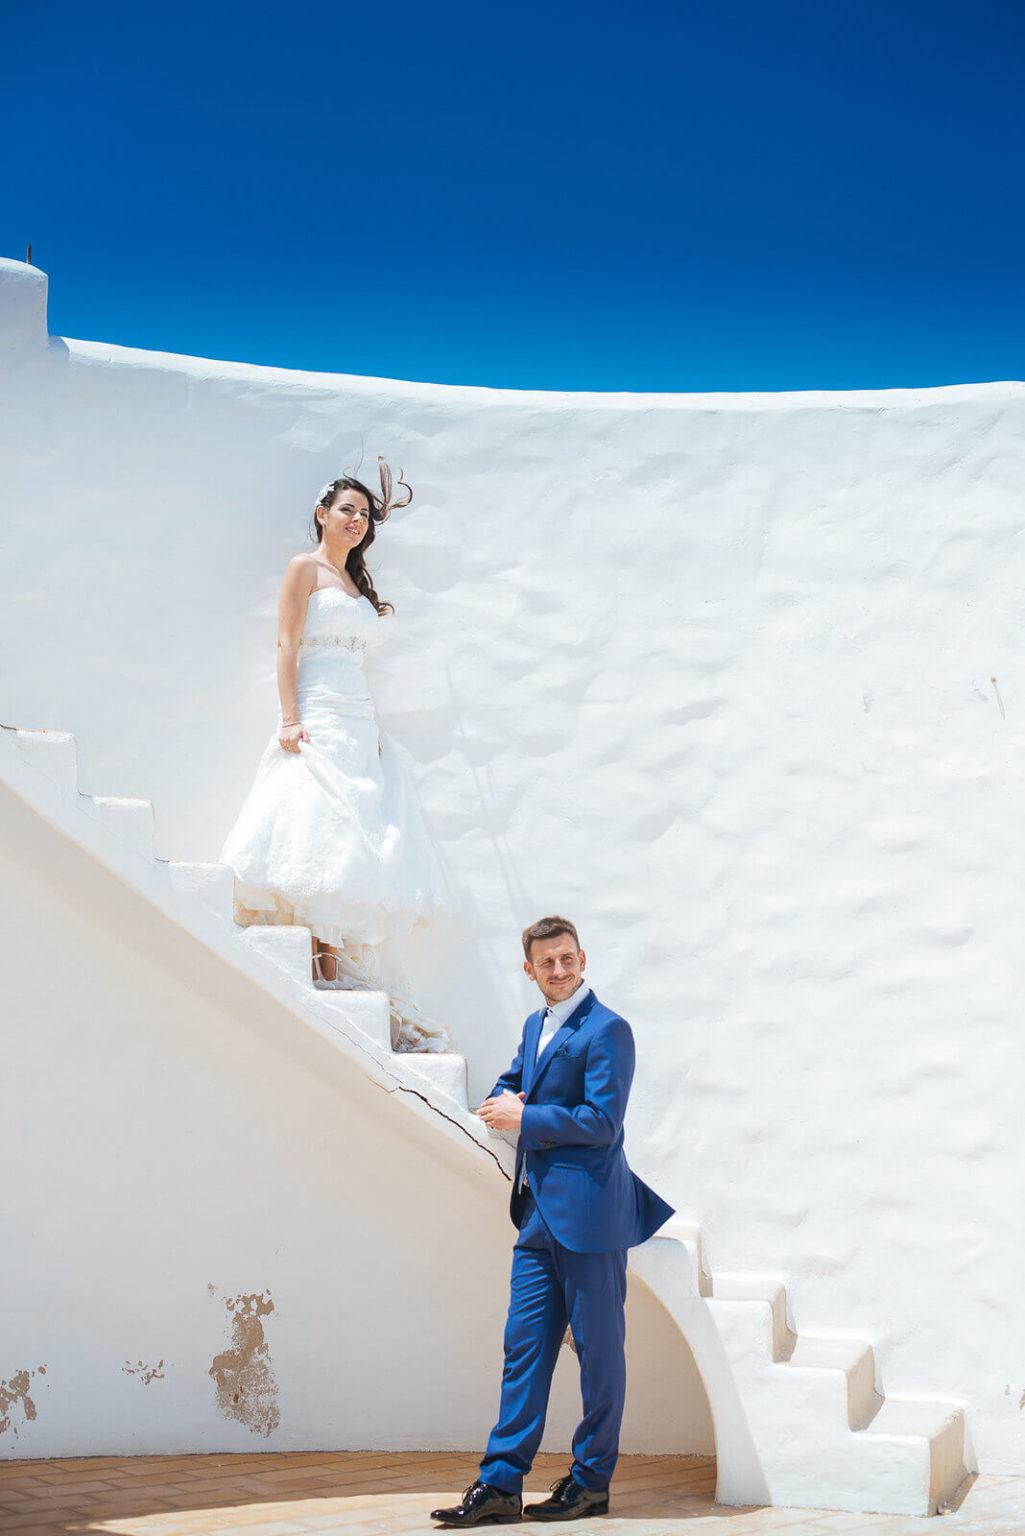 https://www.white-ibiza.com/wp-content/uploads/2020/03/white-ibiza-weddings-dario-sanz-photography-2020-11-1-1025x1536.jpg